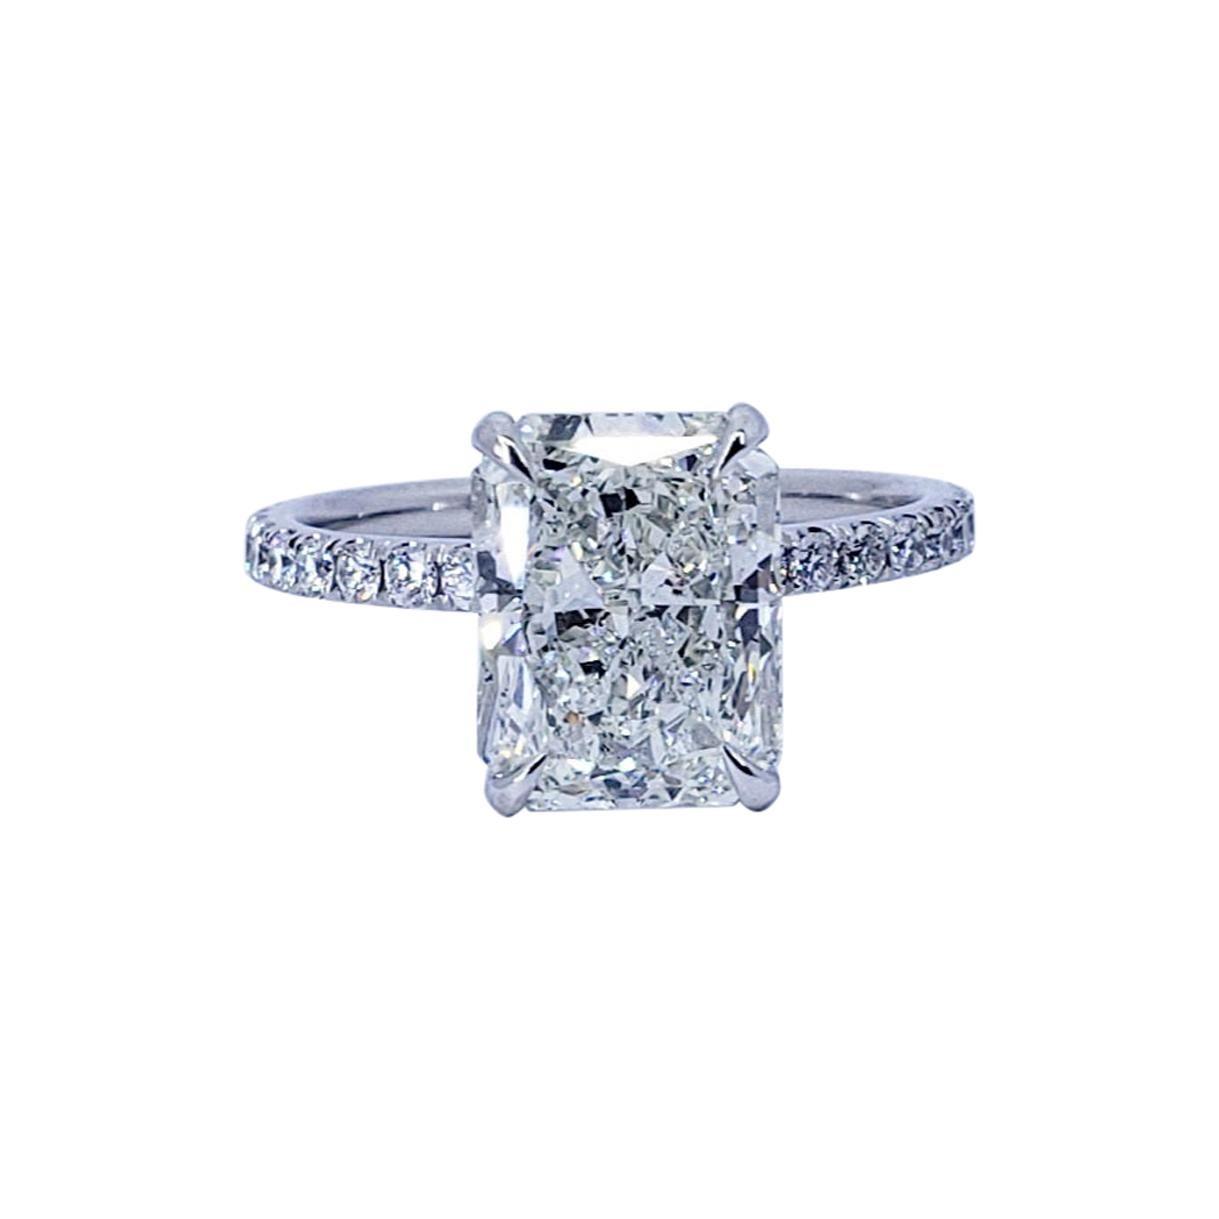 David Rosenberg 3.02 Radiant Cut I/SI2 GIA Diamond Engagement Ring